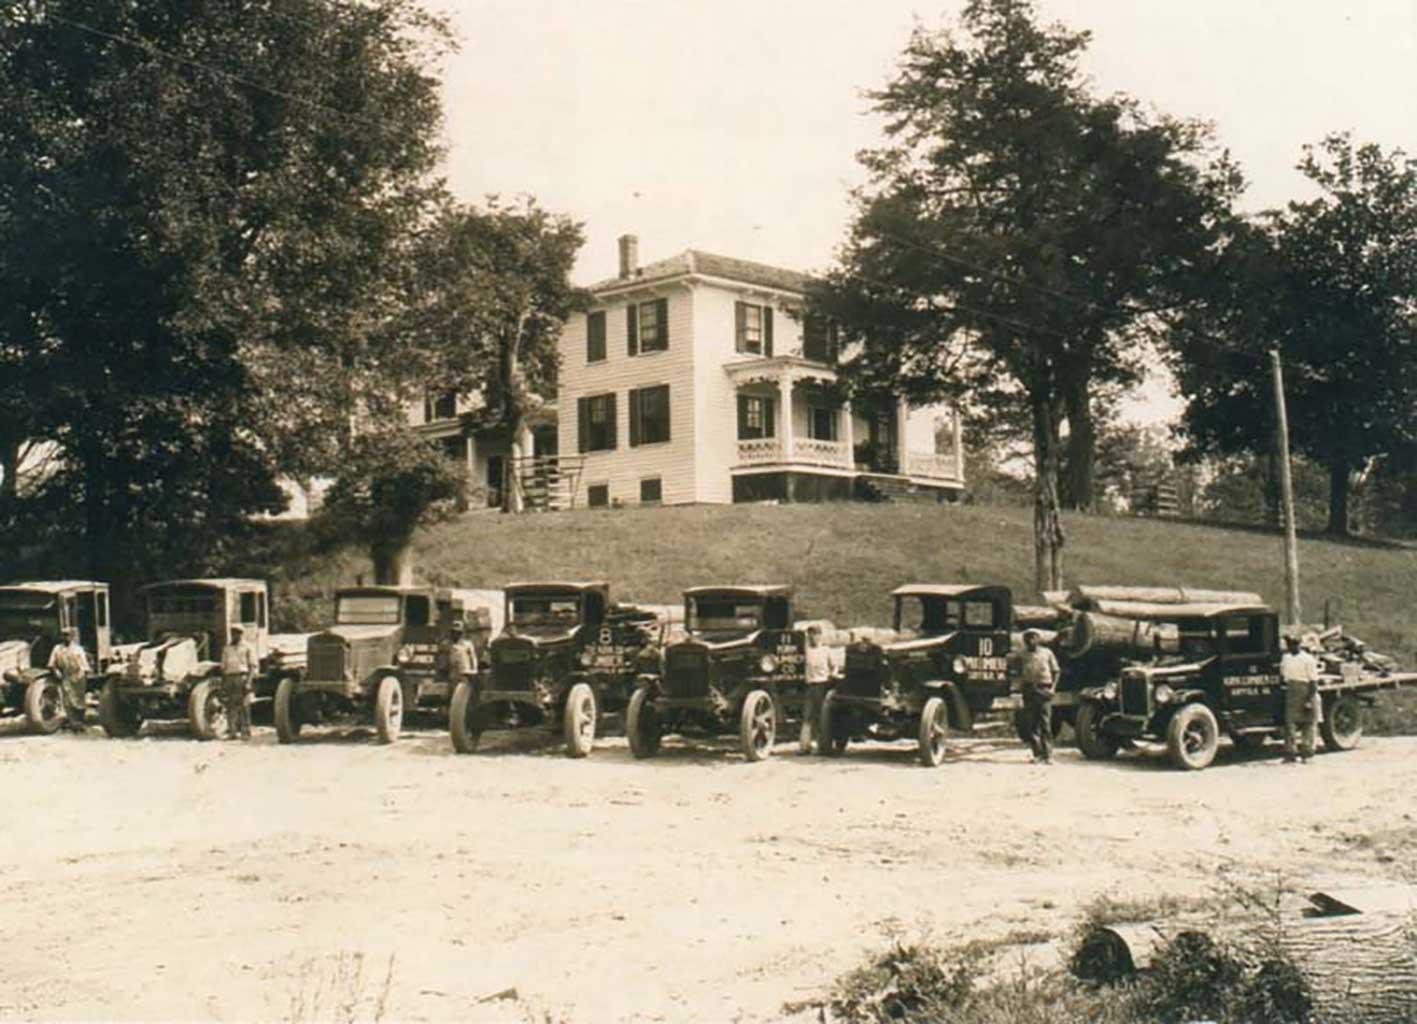 klc-truck-fleet-in-front-of-kirk-home-1926-img191